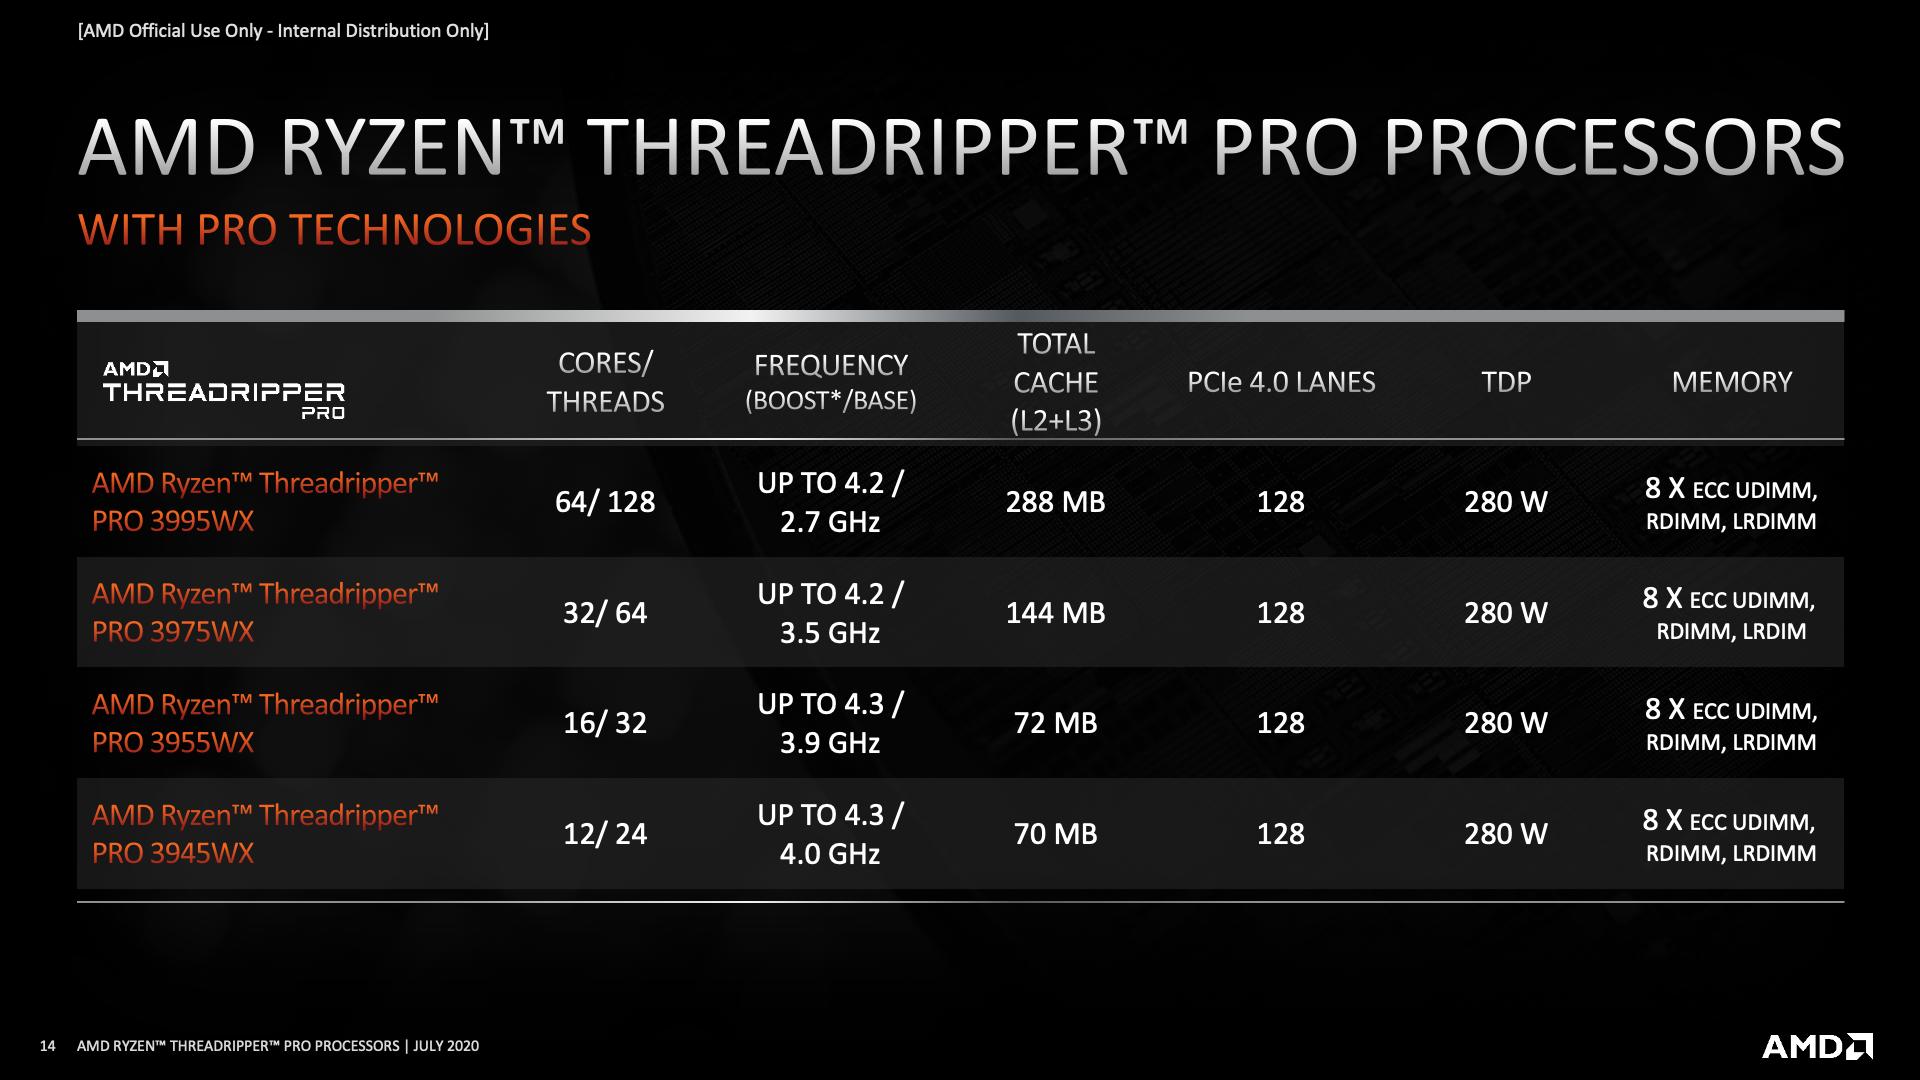 Threadripper Pro processors list